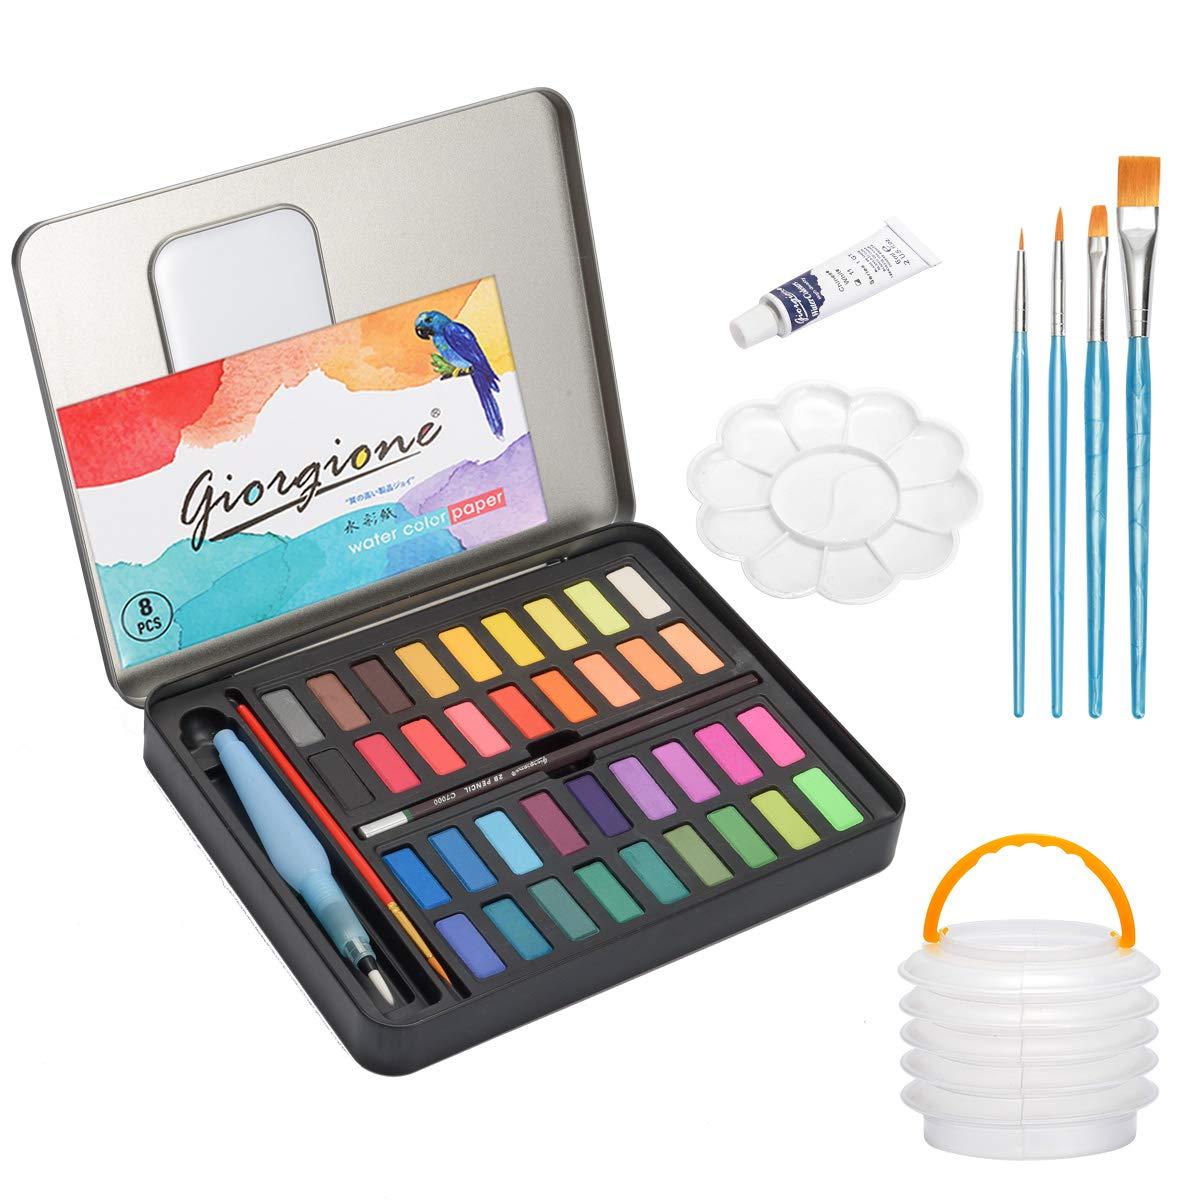 Watercolor Paint Set, Frunsi Professional 36 Assorted Watercolors Travel Pocket Solid Watercolor Kit with Water Brush Pen, Watercolor Paper, Watercolor Kit for Sketching Painting Coloring Drawing Art